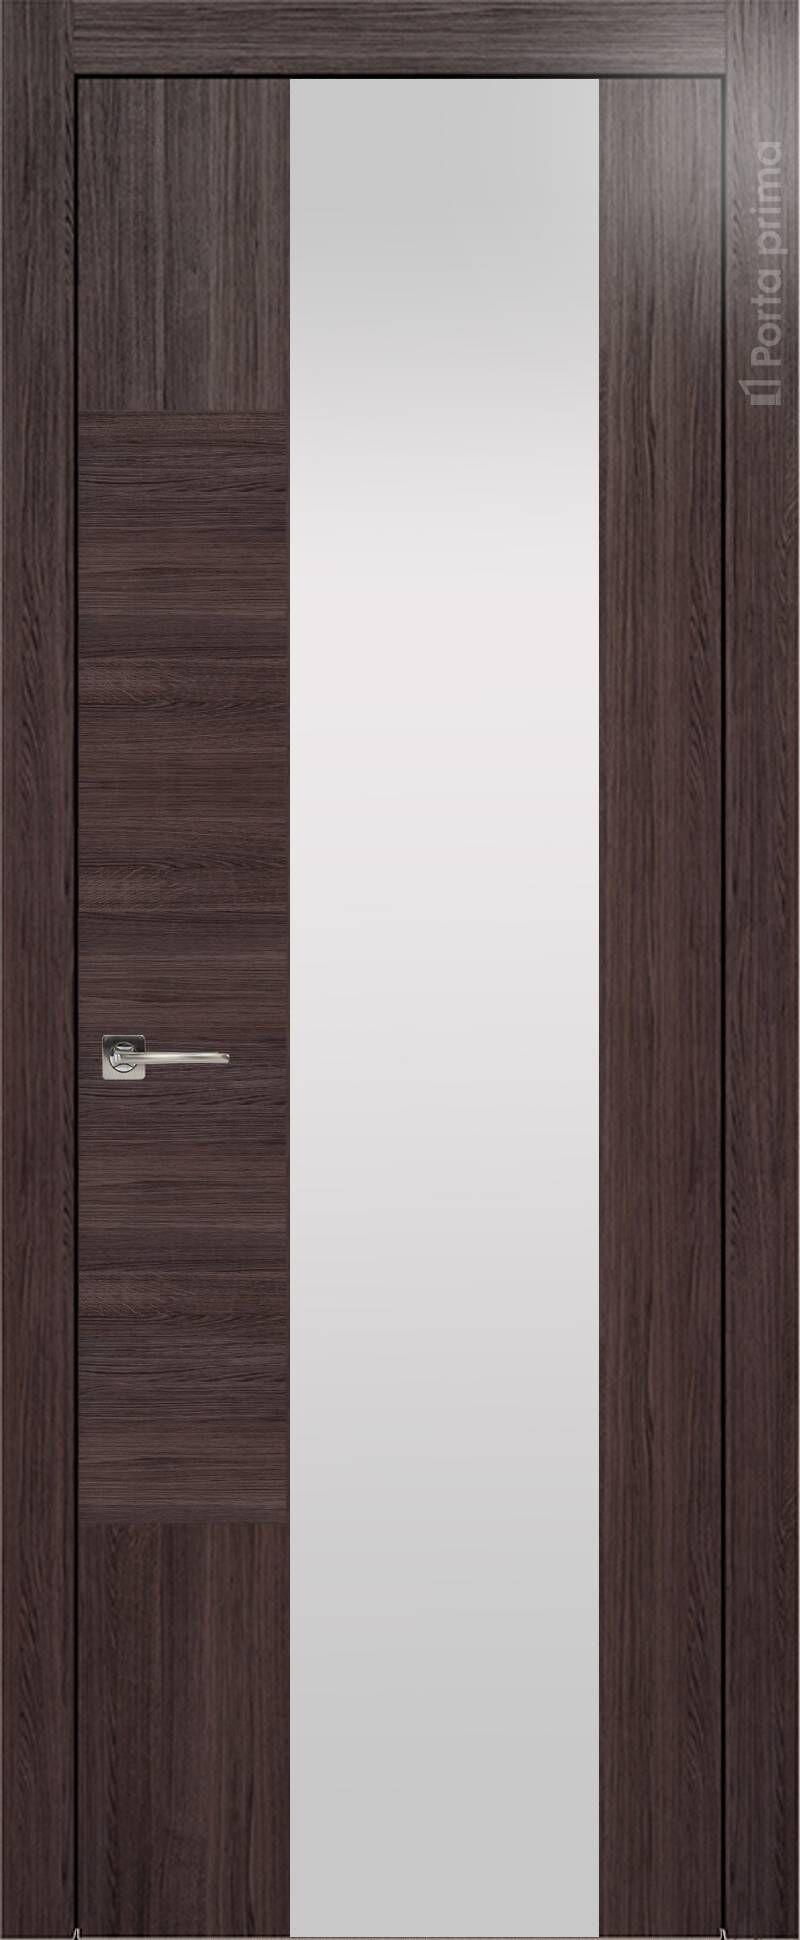 Tivoli Е-1 цвет - Венге Нуар Со стеклом (ДО)